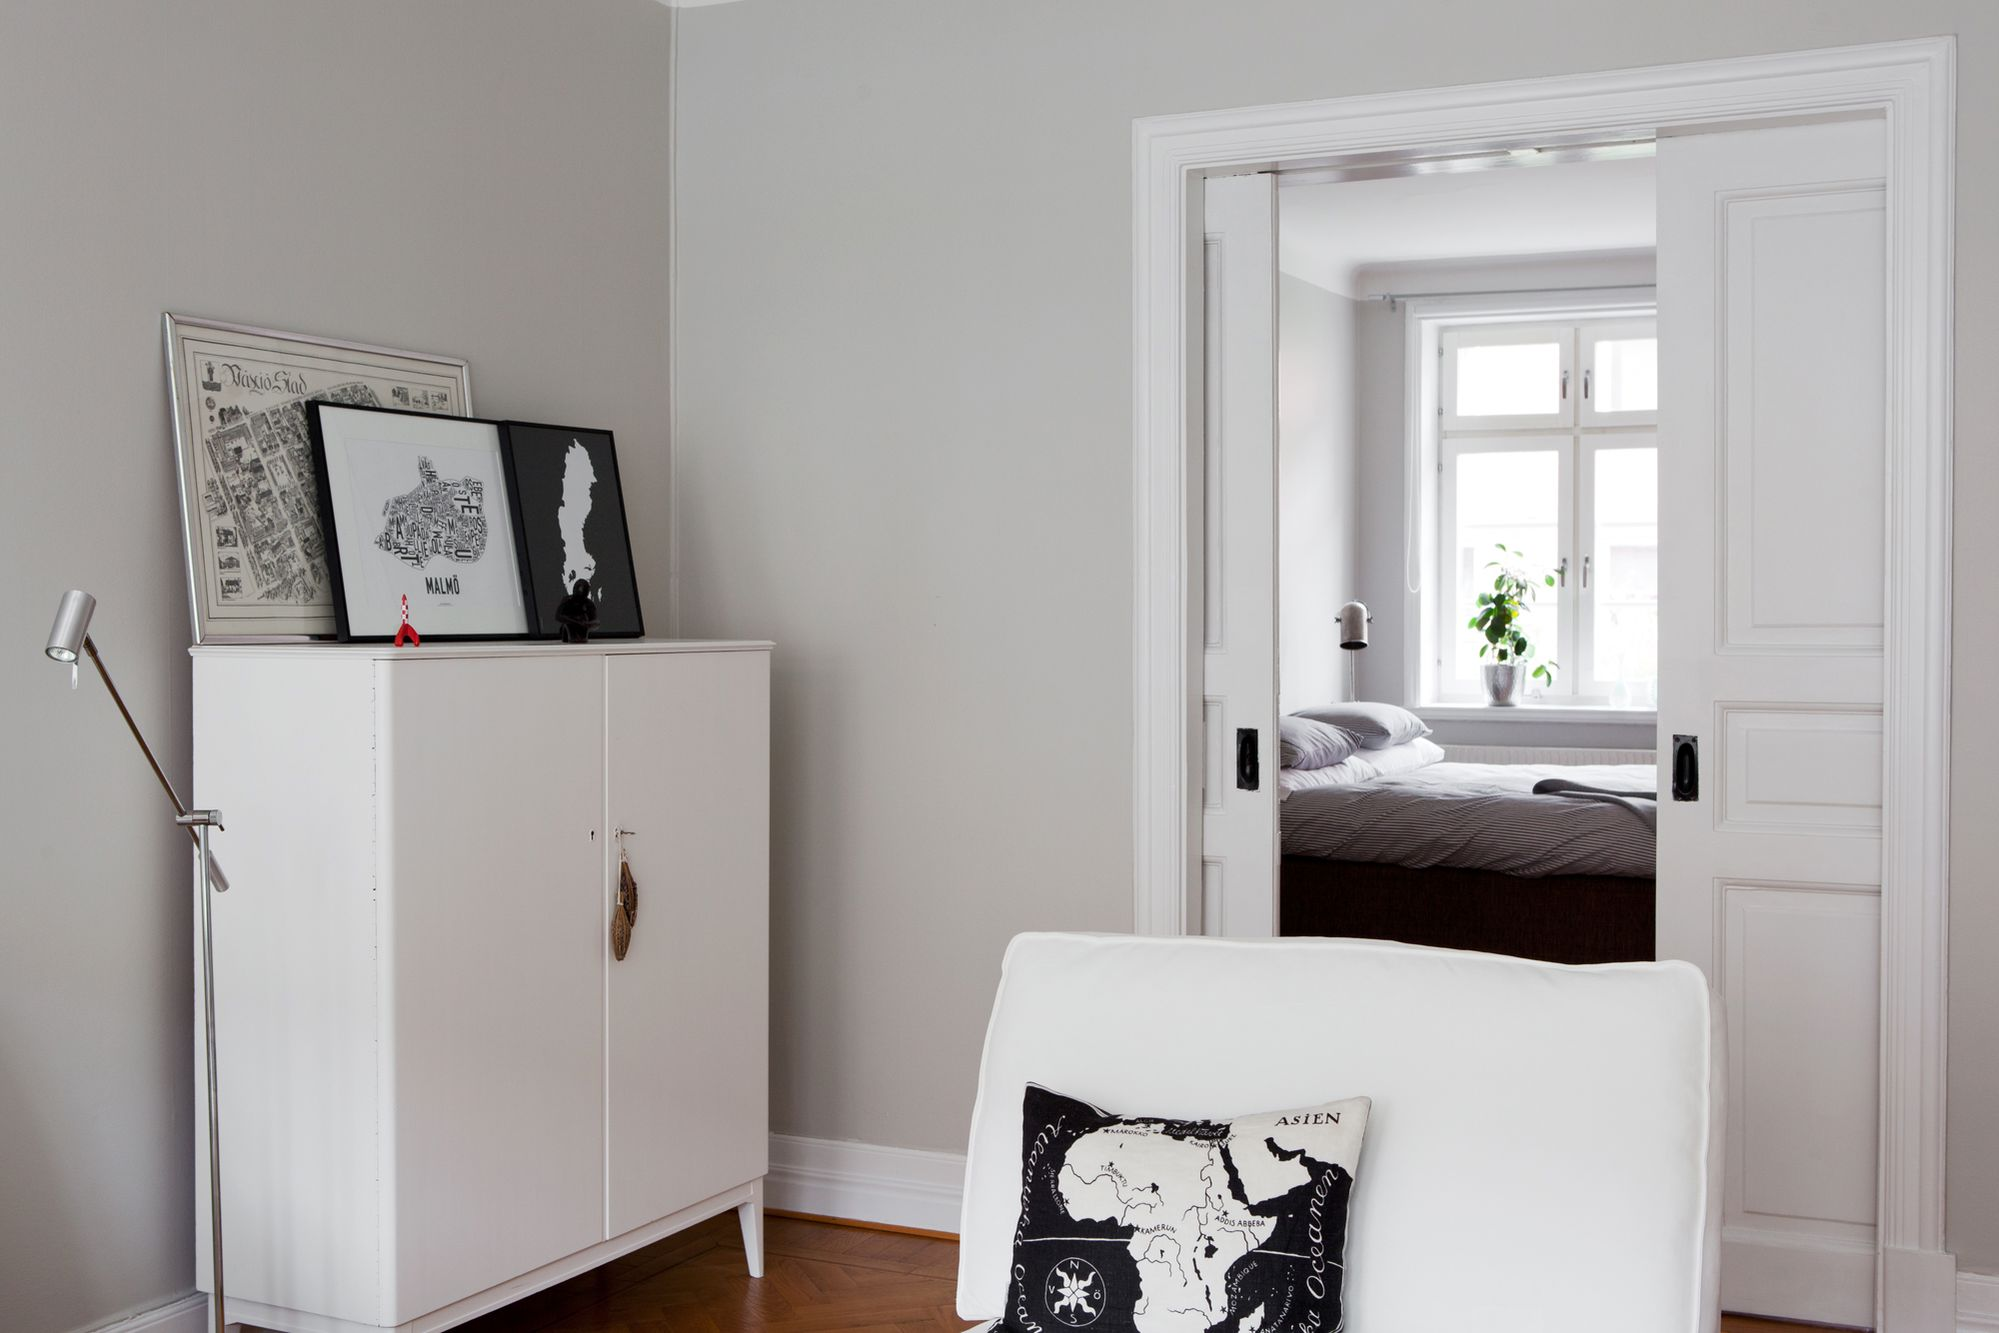 Paredes grises muebles blancos suelo de madera blog for Decoracion de paredes interiores